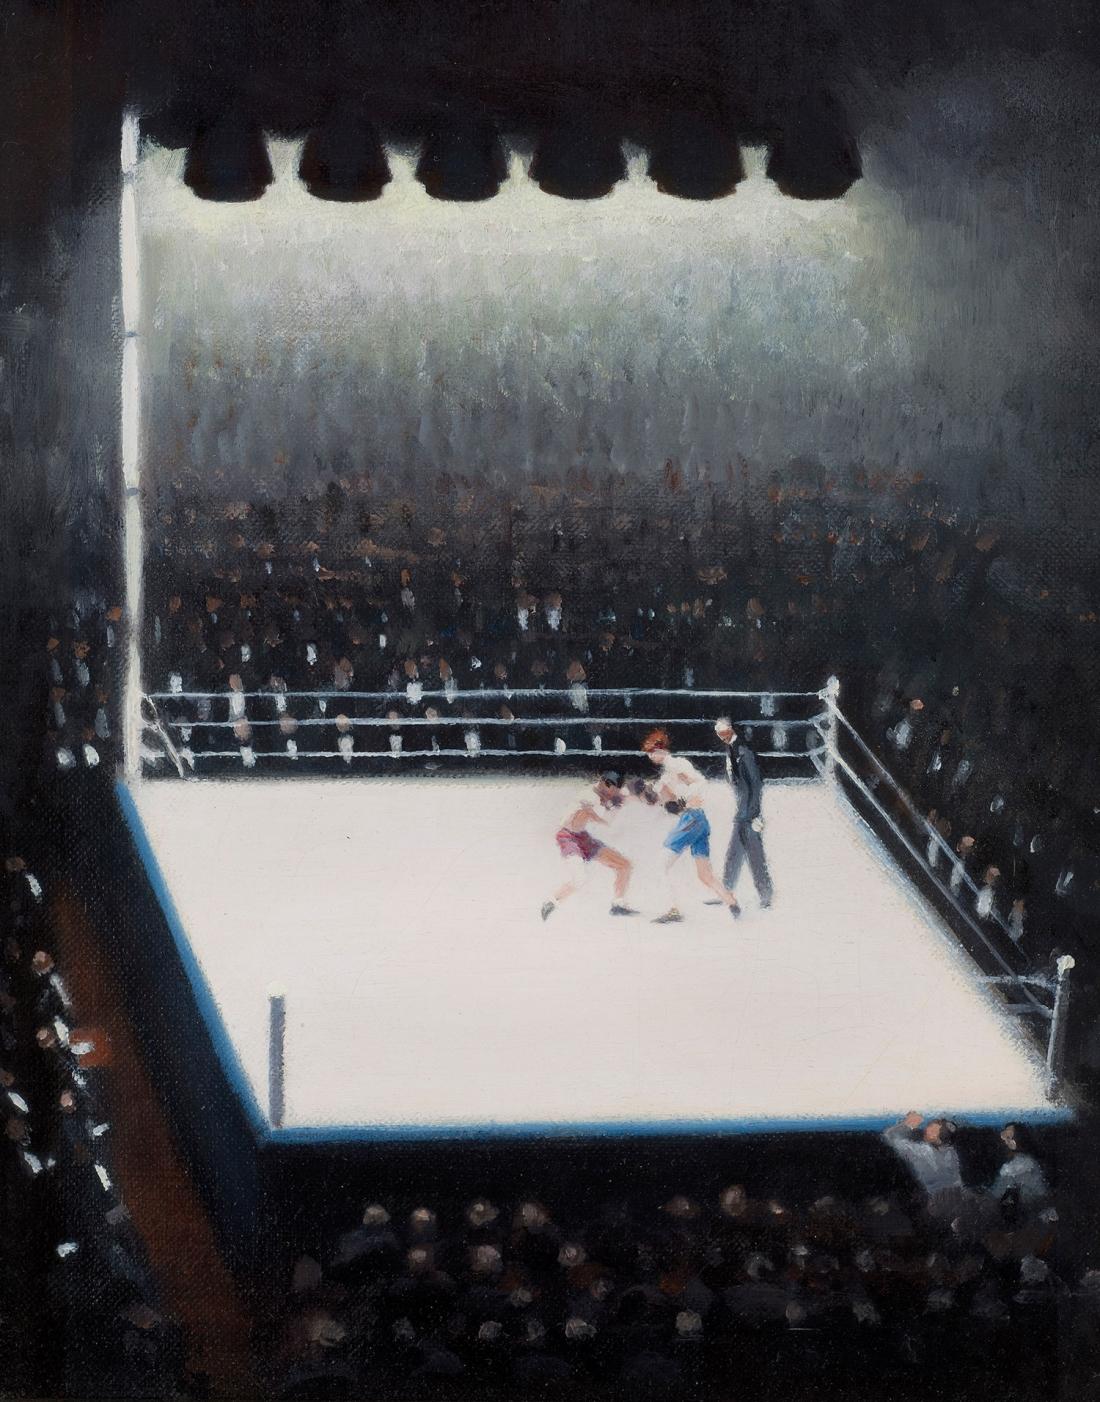 Gluck, Baldock vs. Bell at the Royal Albert Hall